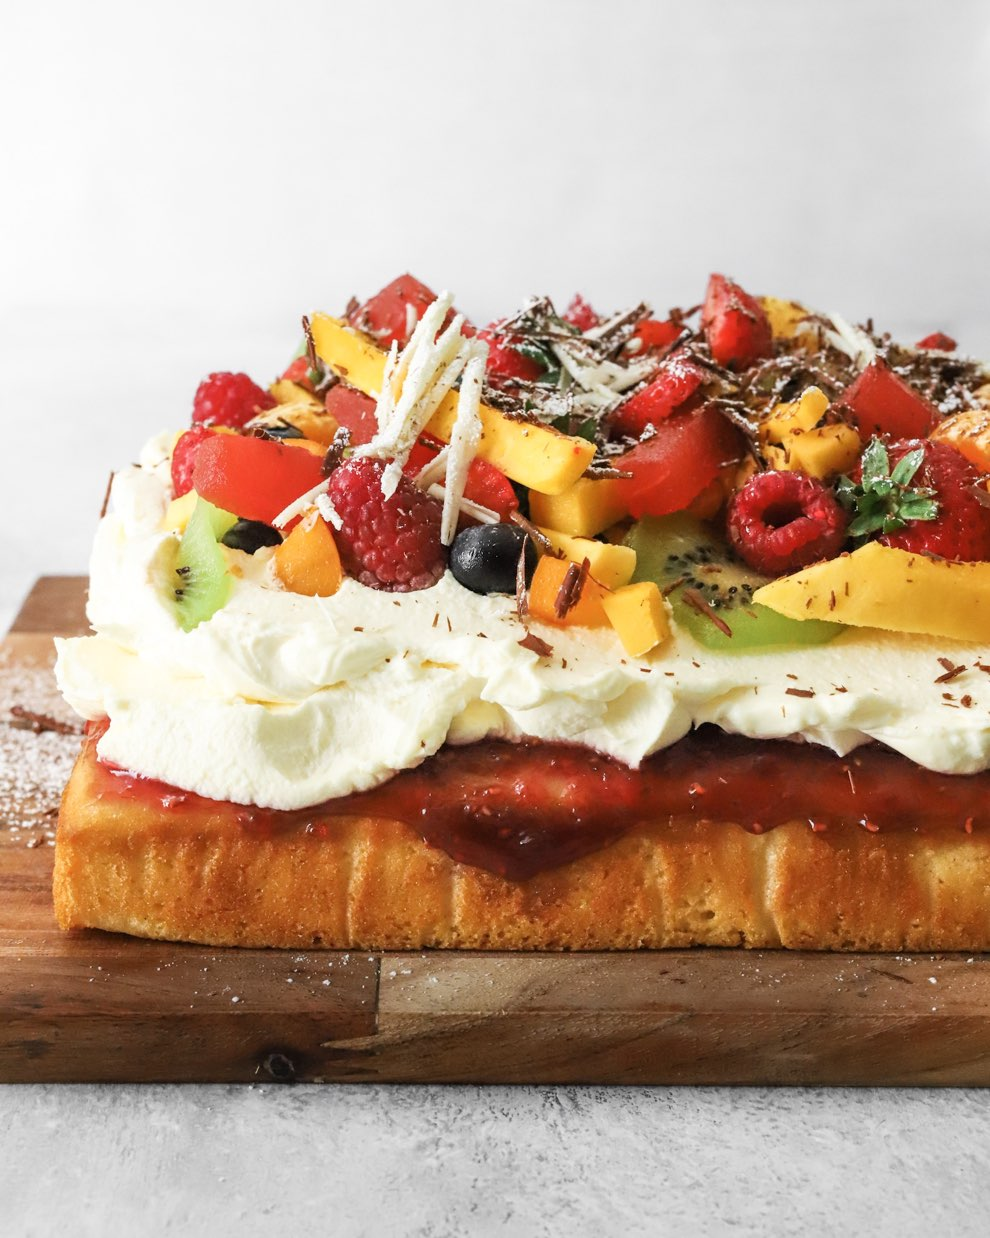 Vegan Fresh Fruit Cake with Whipped Cream